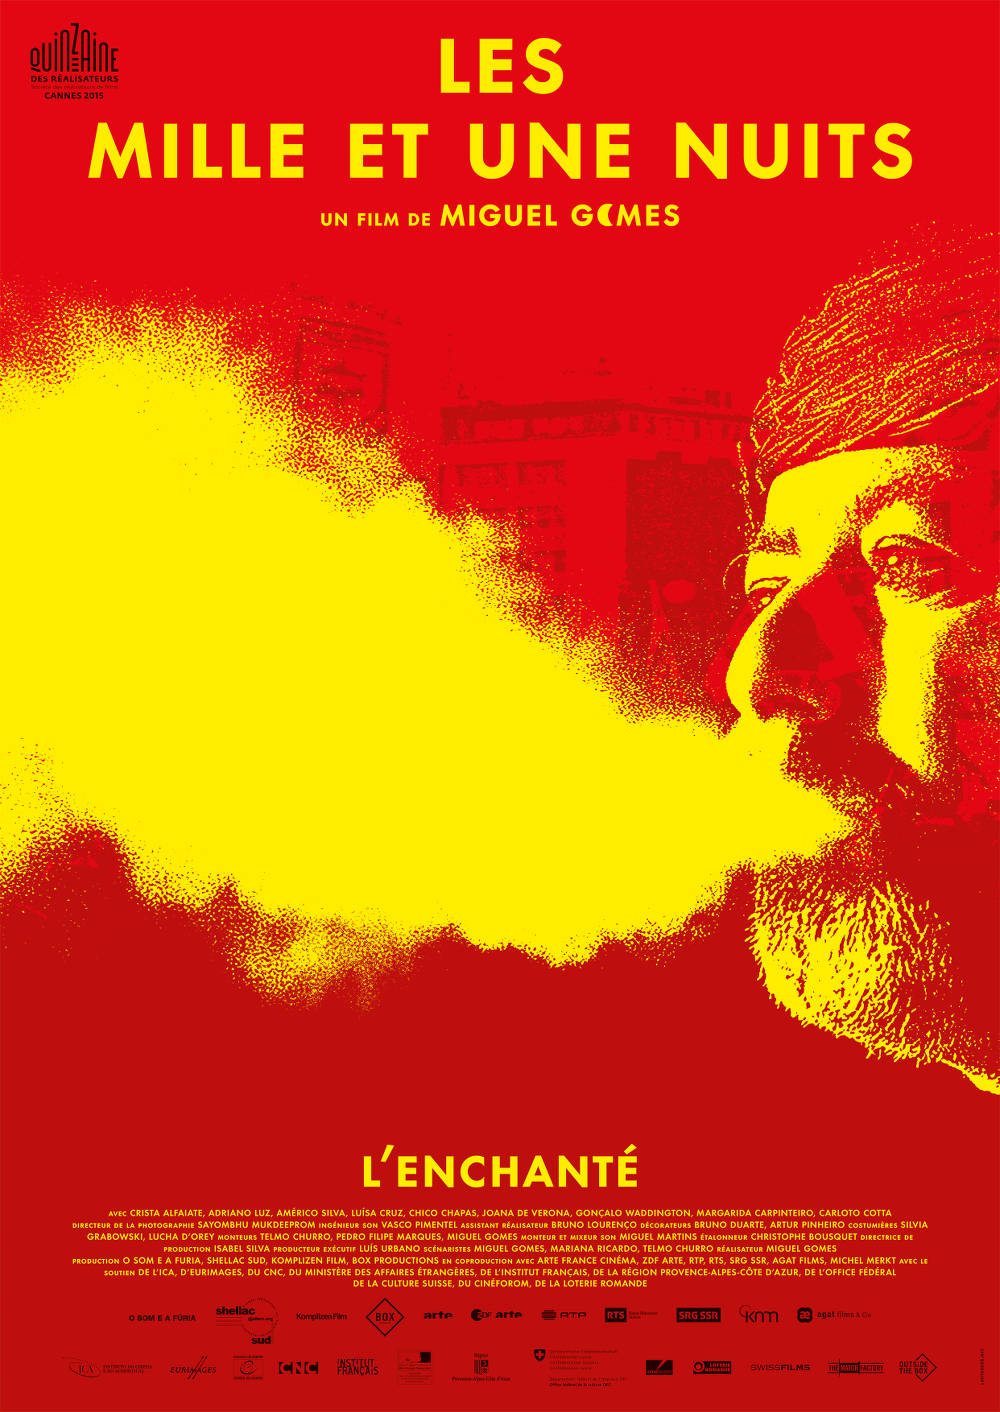 3-lenchante-low-resolution